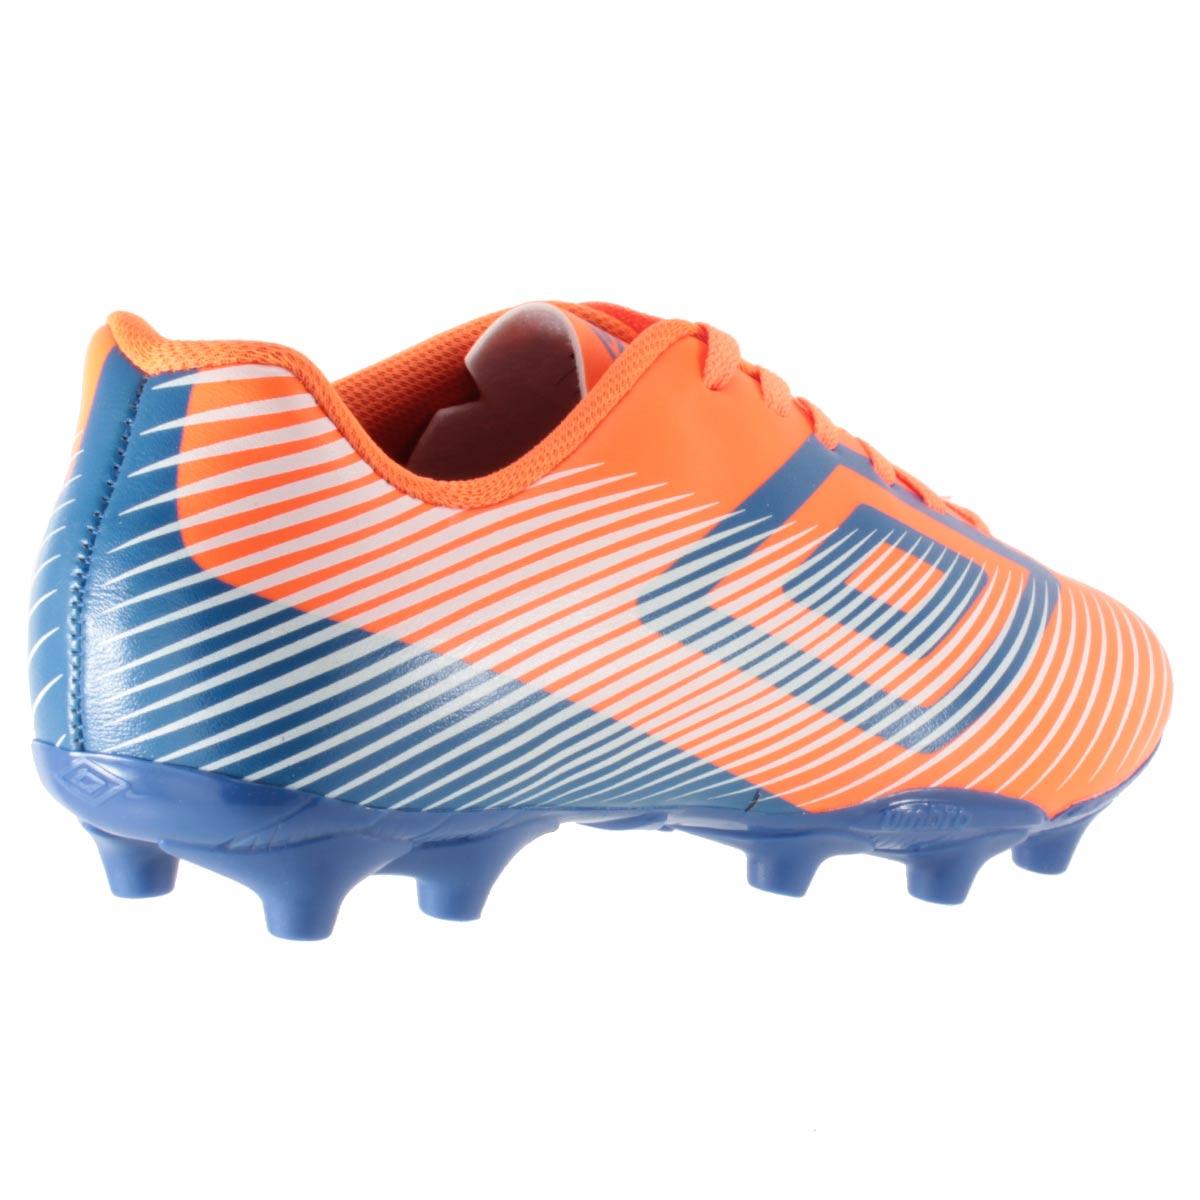 Chuteira Umbro Speed 2 Futebol Campo 0F70036